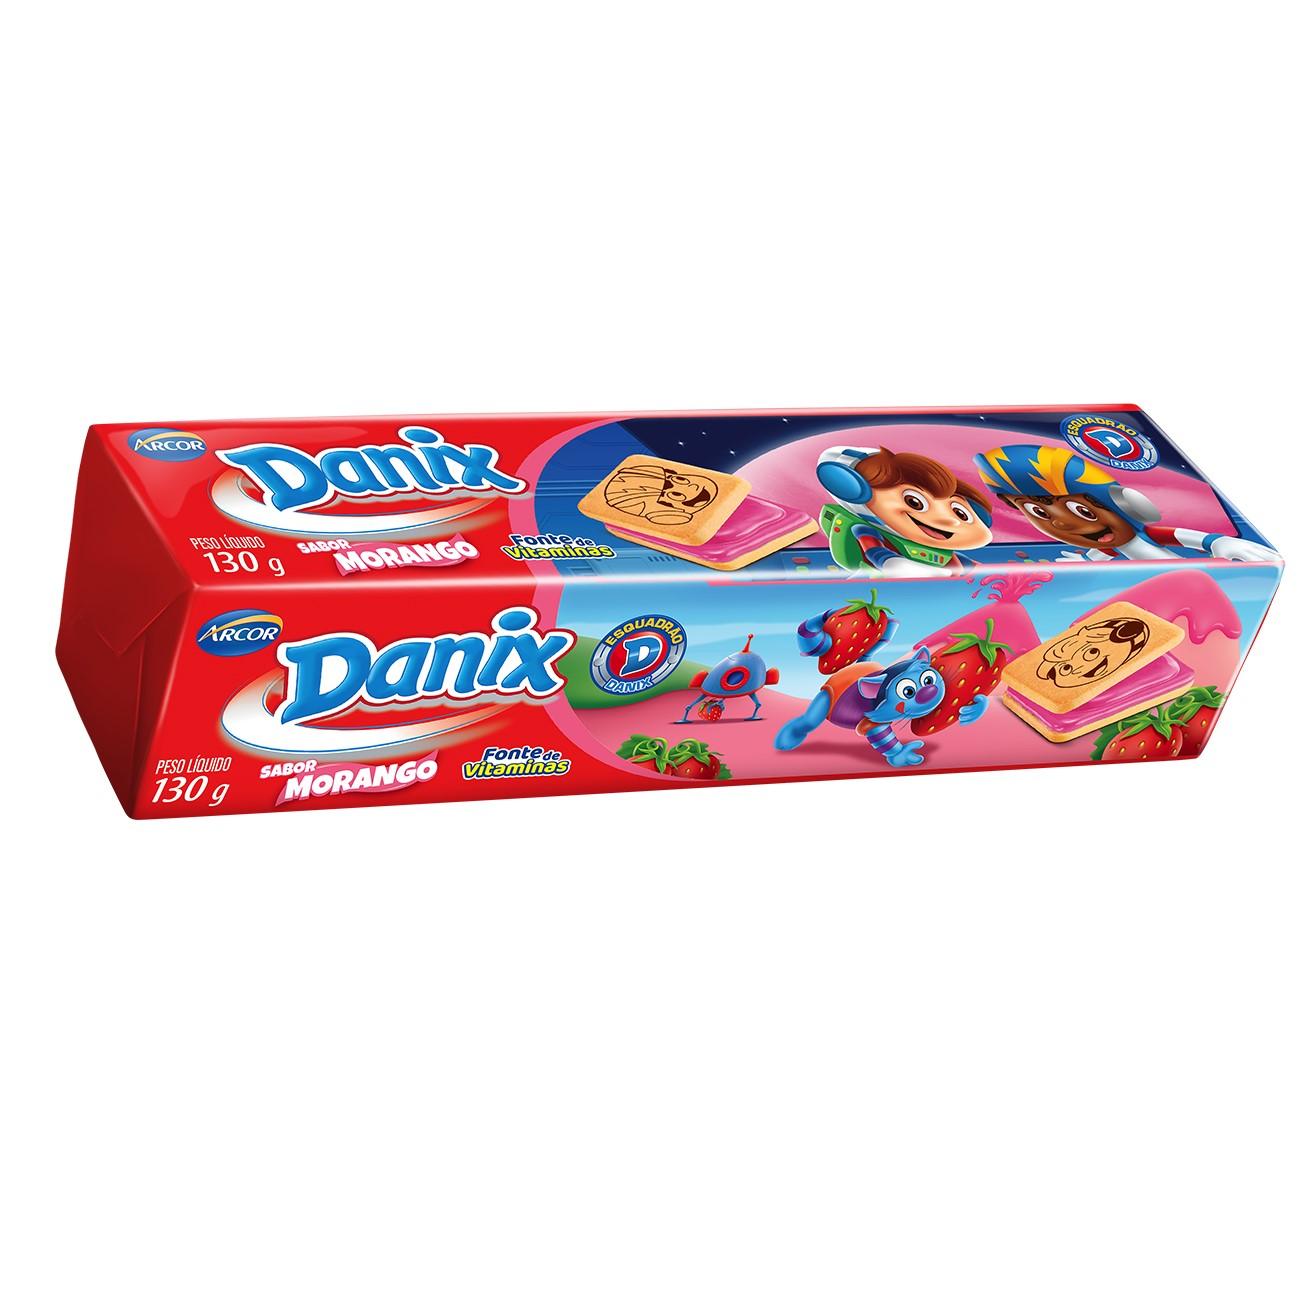 Biscoito Danix Recheado Morango Patrulha Canina 130g